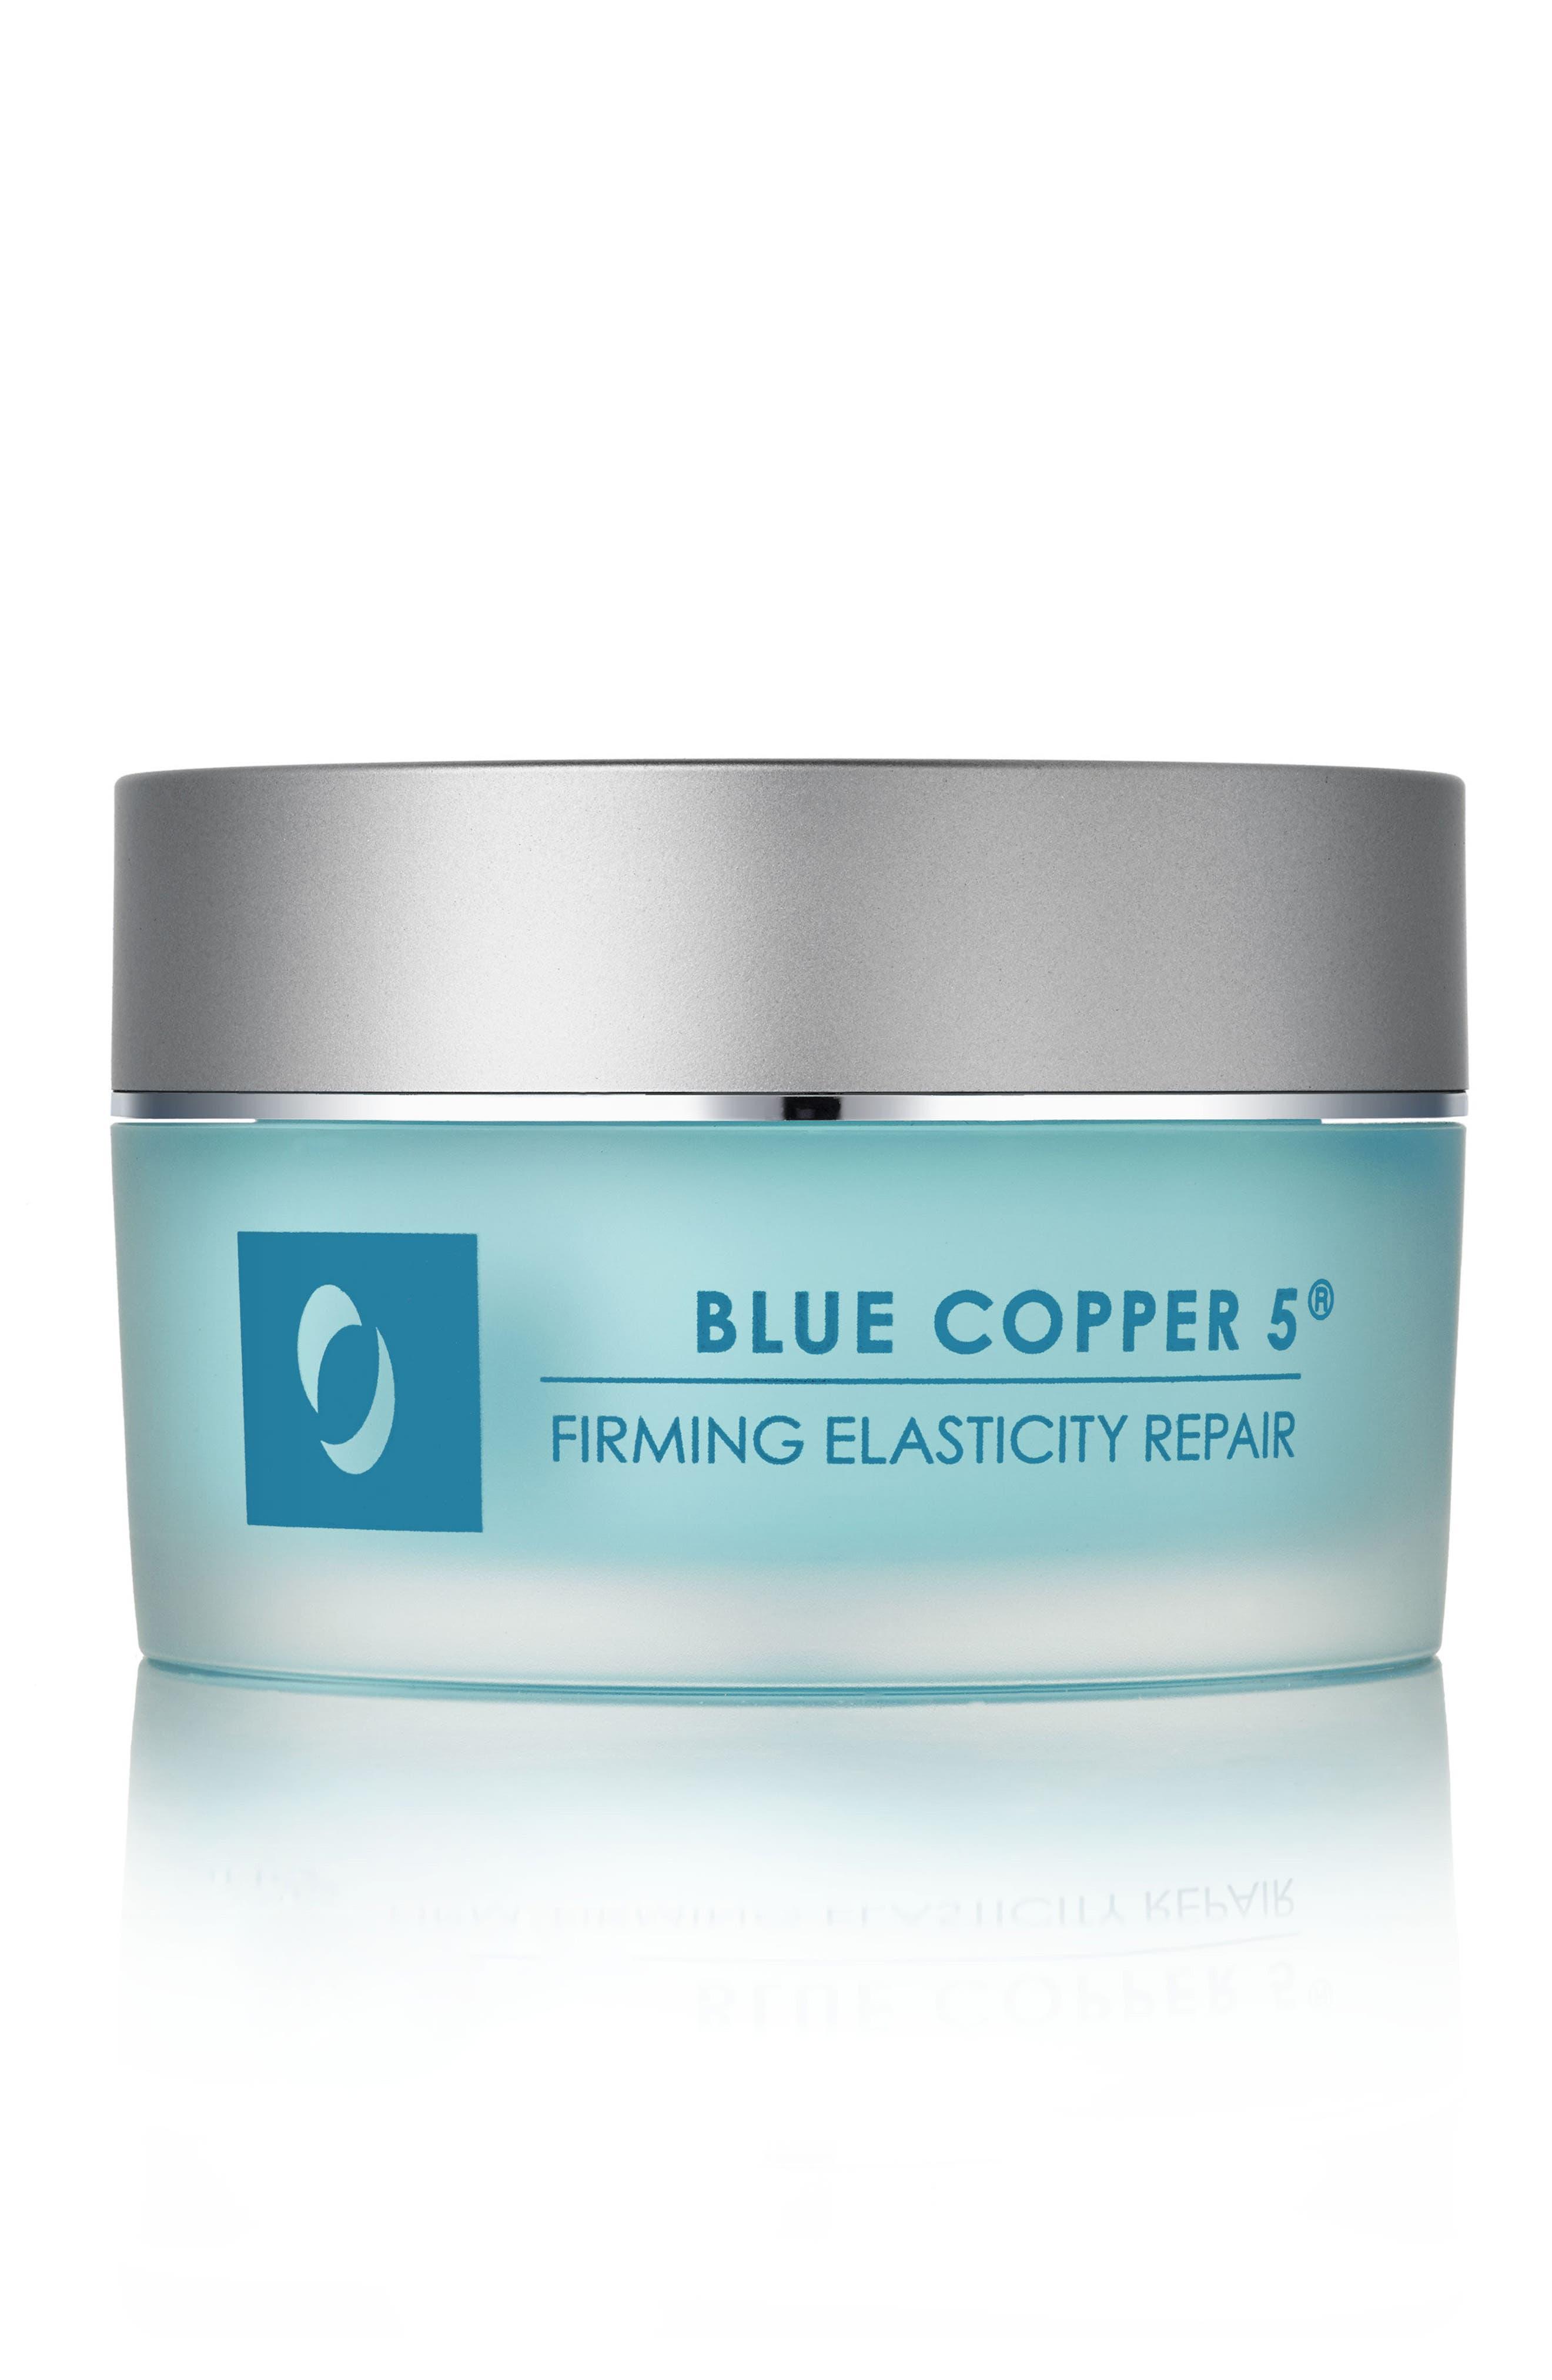 OSMOTICS COSMECEUTICALS Blue Copper 5 Firming Elasticity Repair, Main, color, NO COLOR